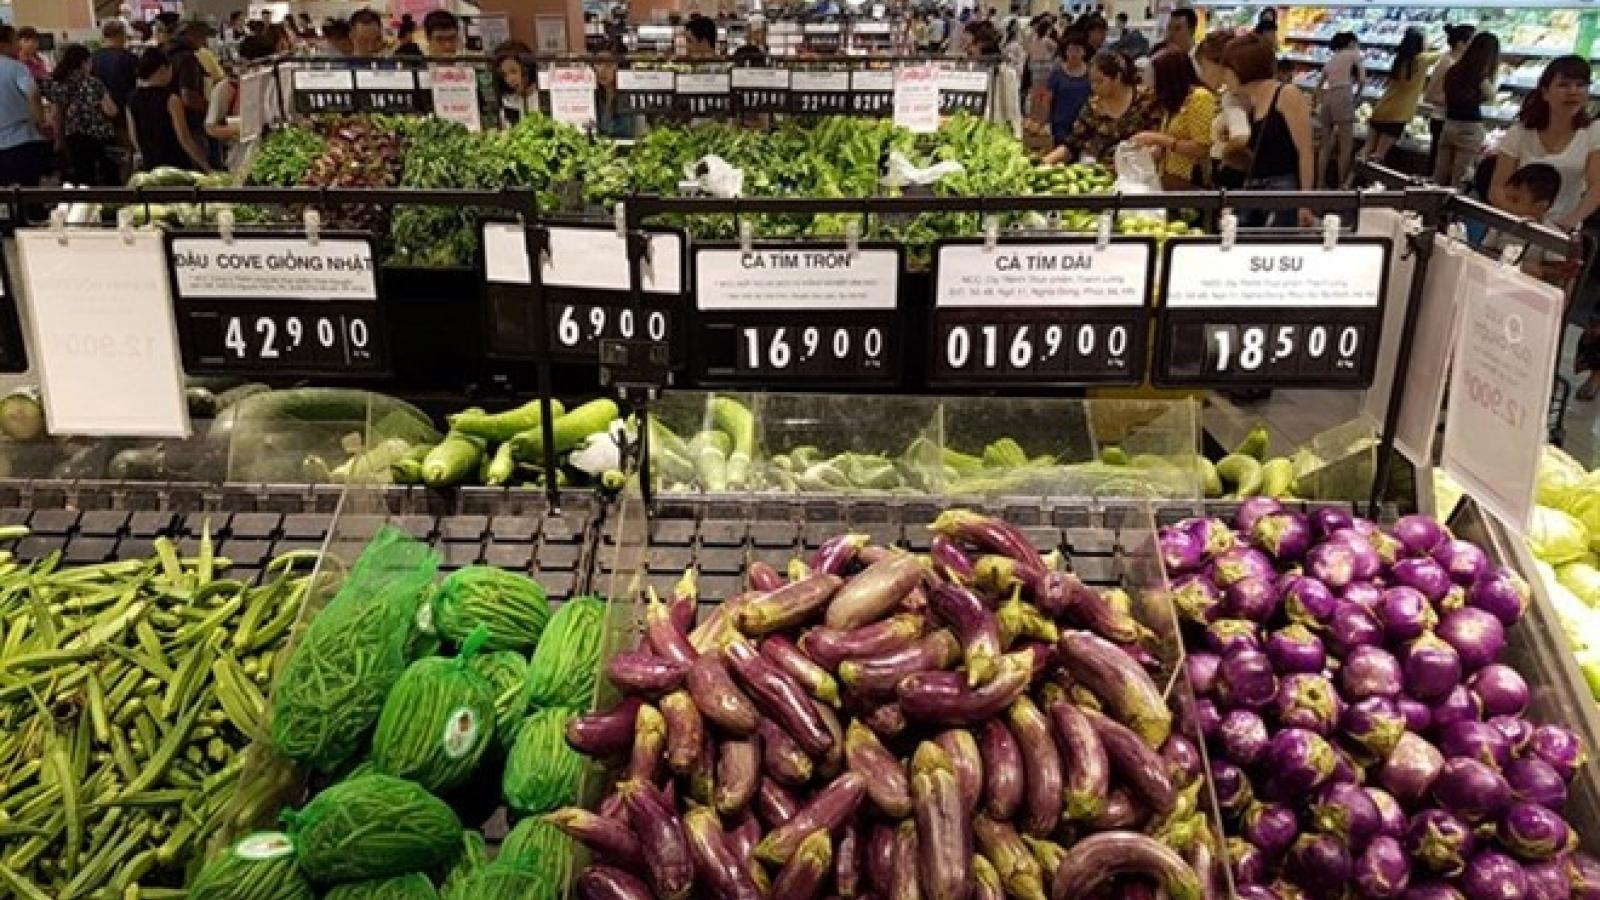 Retail sales, services revenue up by 10%